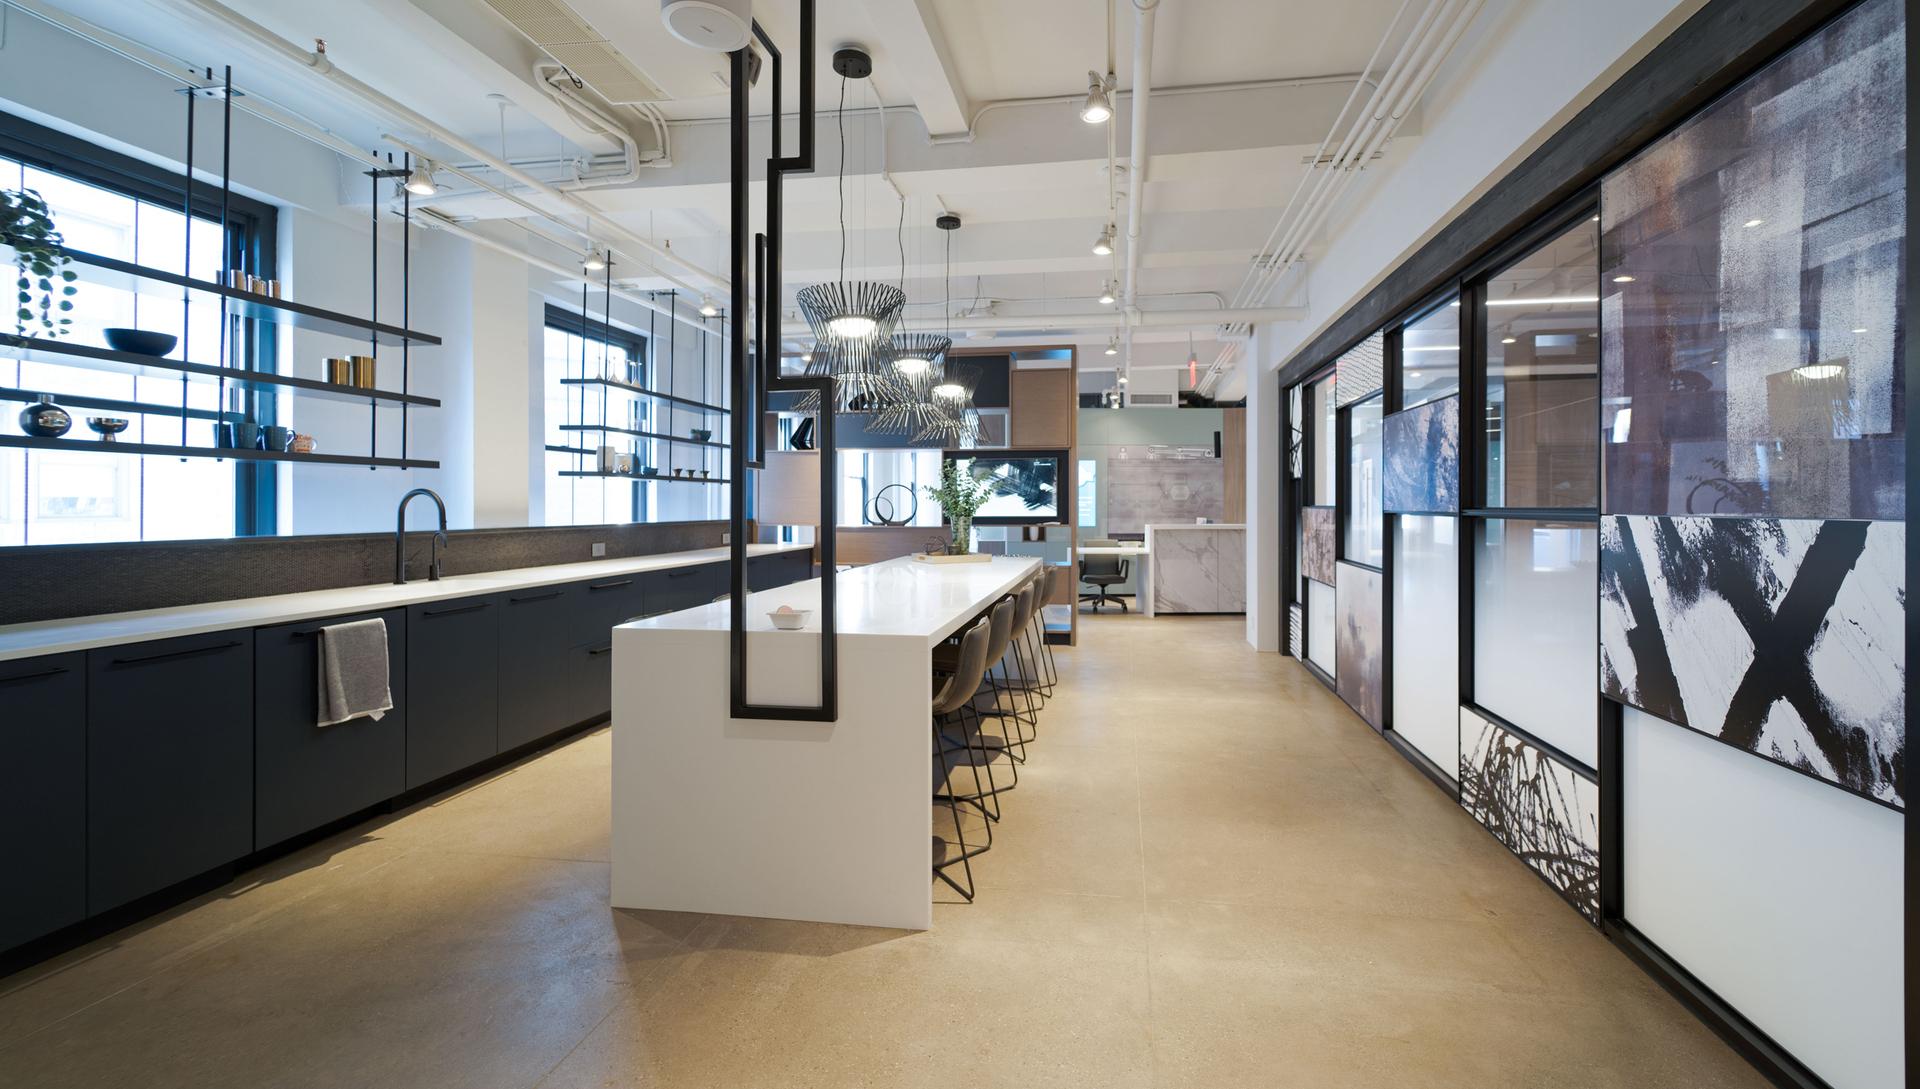 New York DIRTT Experience Center photo showing a kitchen built using DIRTT custom modular interior solutions.